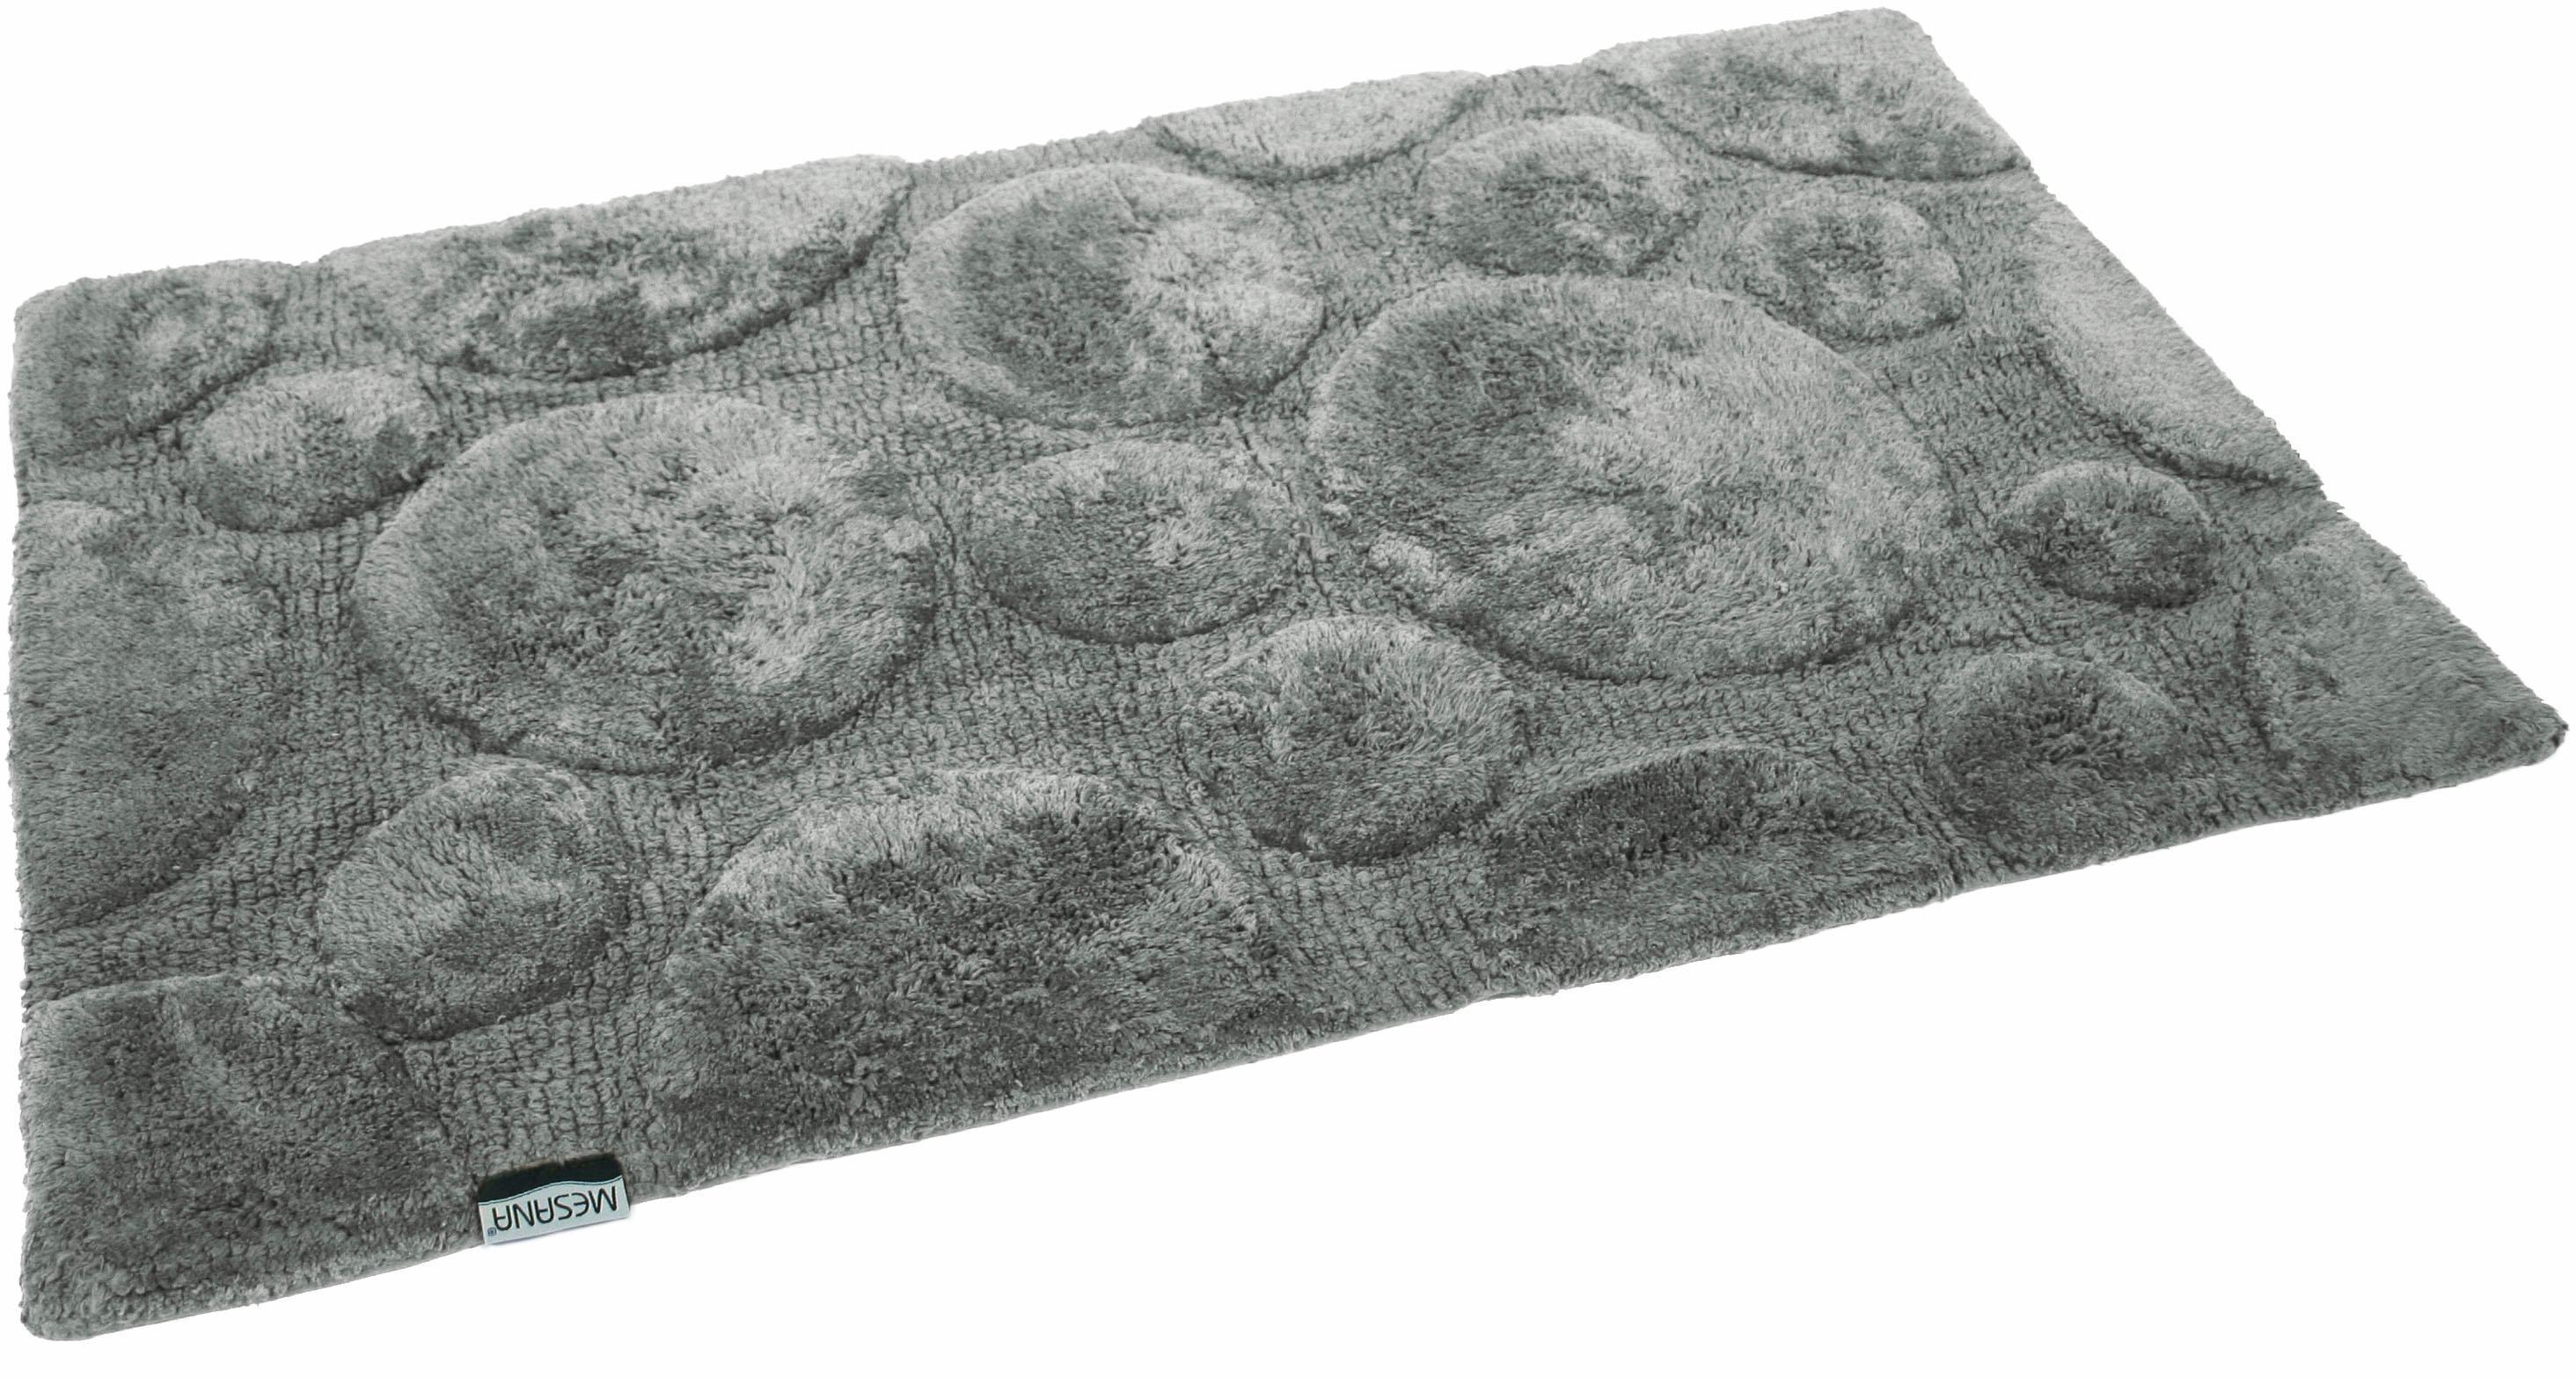 Badematte Stones MESANA Höhe 15 mm rutschhemmend beschichtet fußbodenheizungsgeeignet